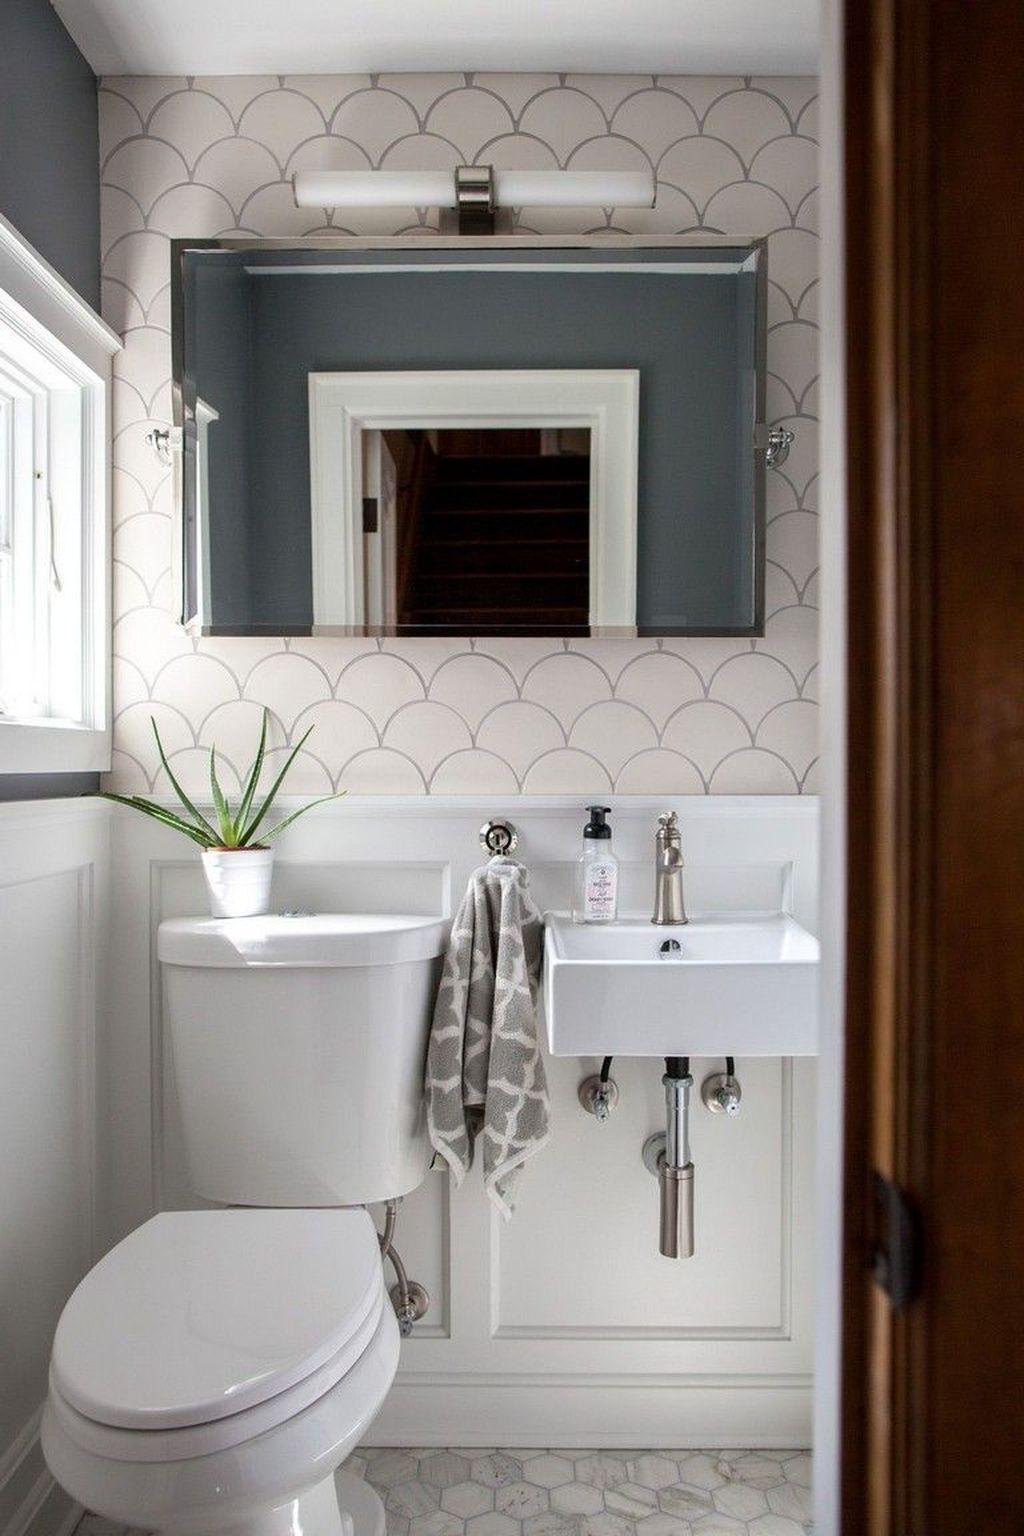 half bathroom remodel in 2020 20 amazing ideas and on bathroom renovation ideas 2020 id=73784